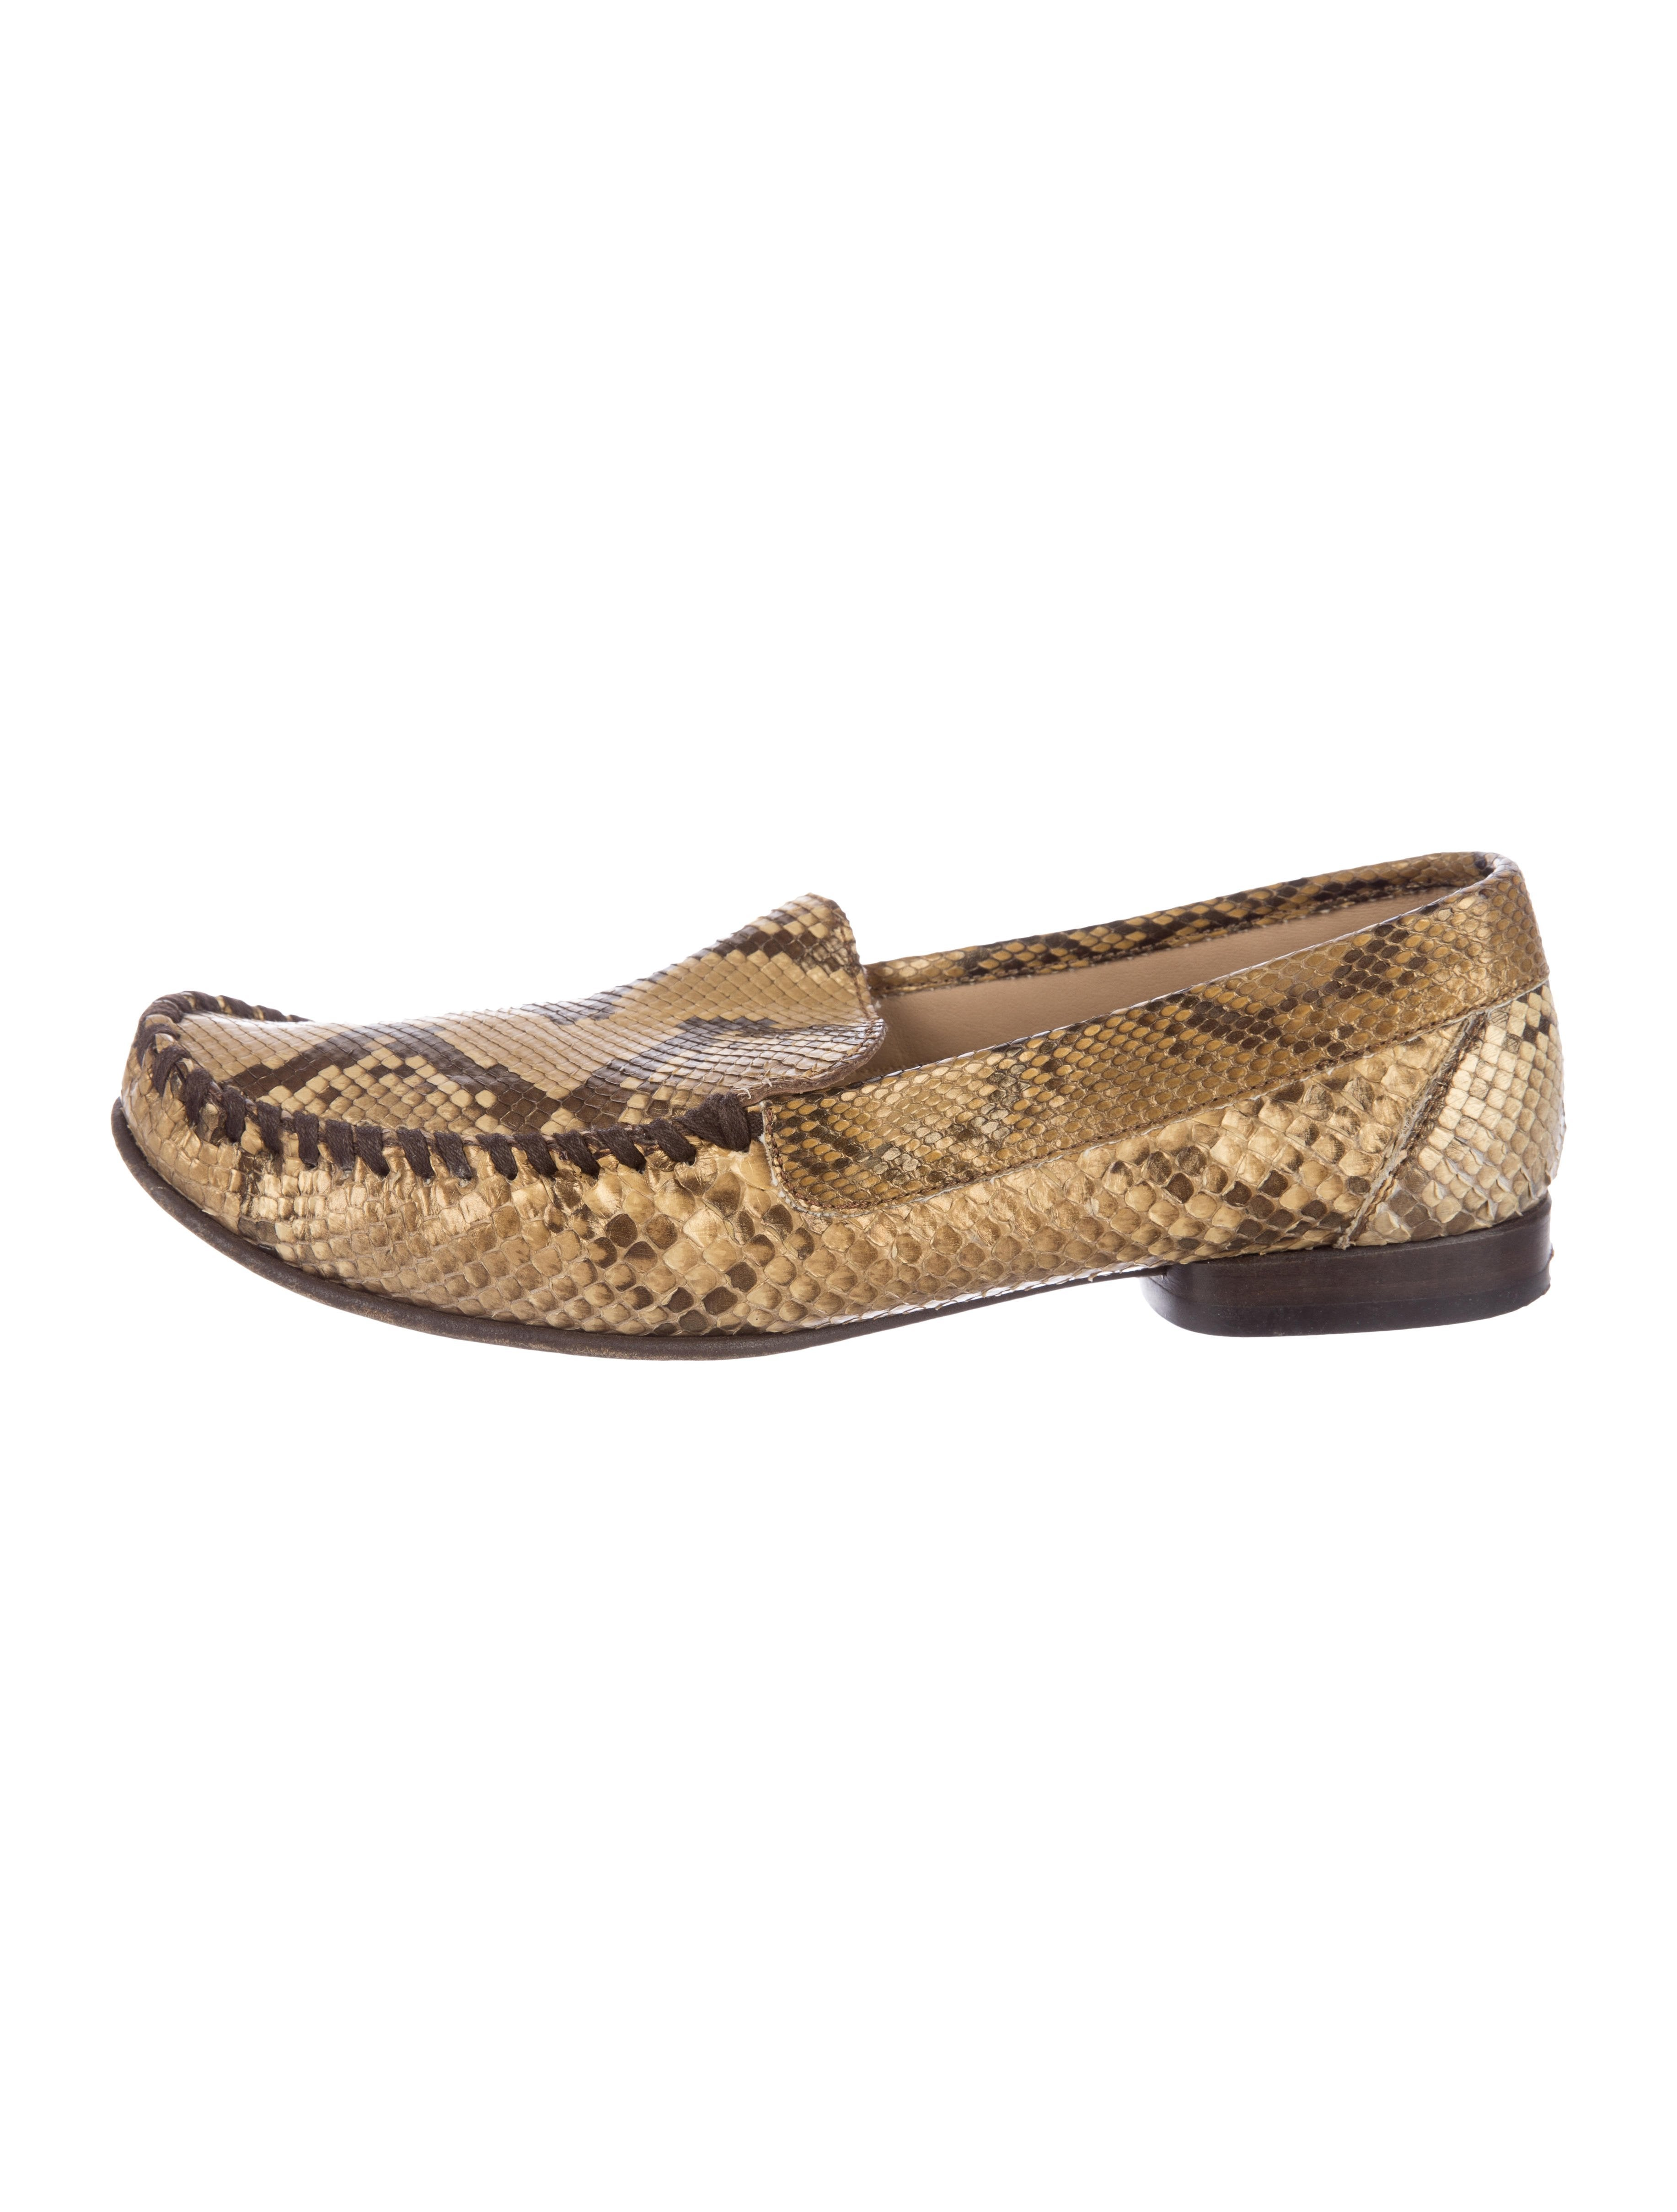 2014 new sale online free shipping Manchester Salvatore Ferragamo Snakeskin Round-Toe Loafers best seller online sale 2015 big sale sale online icuLlC